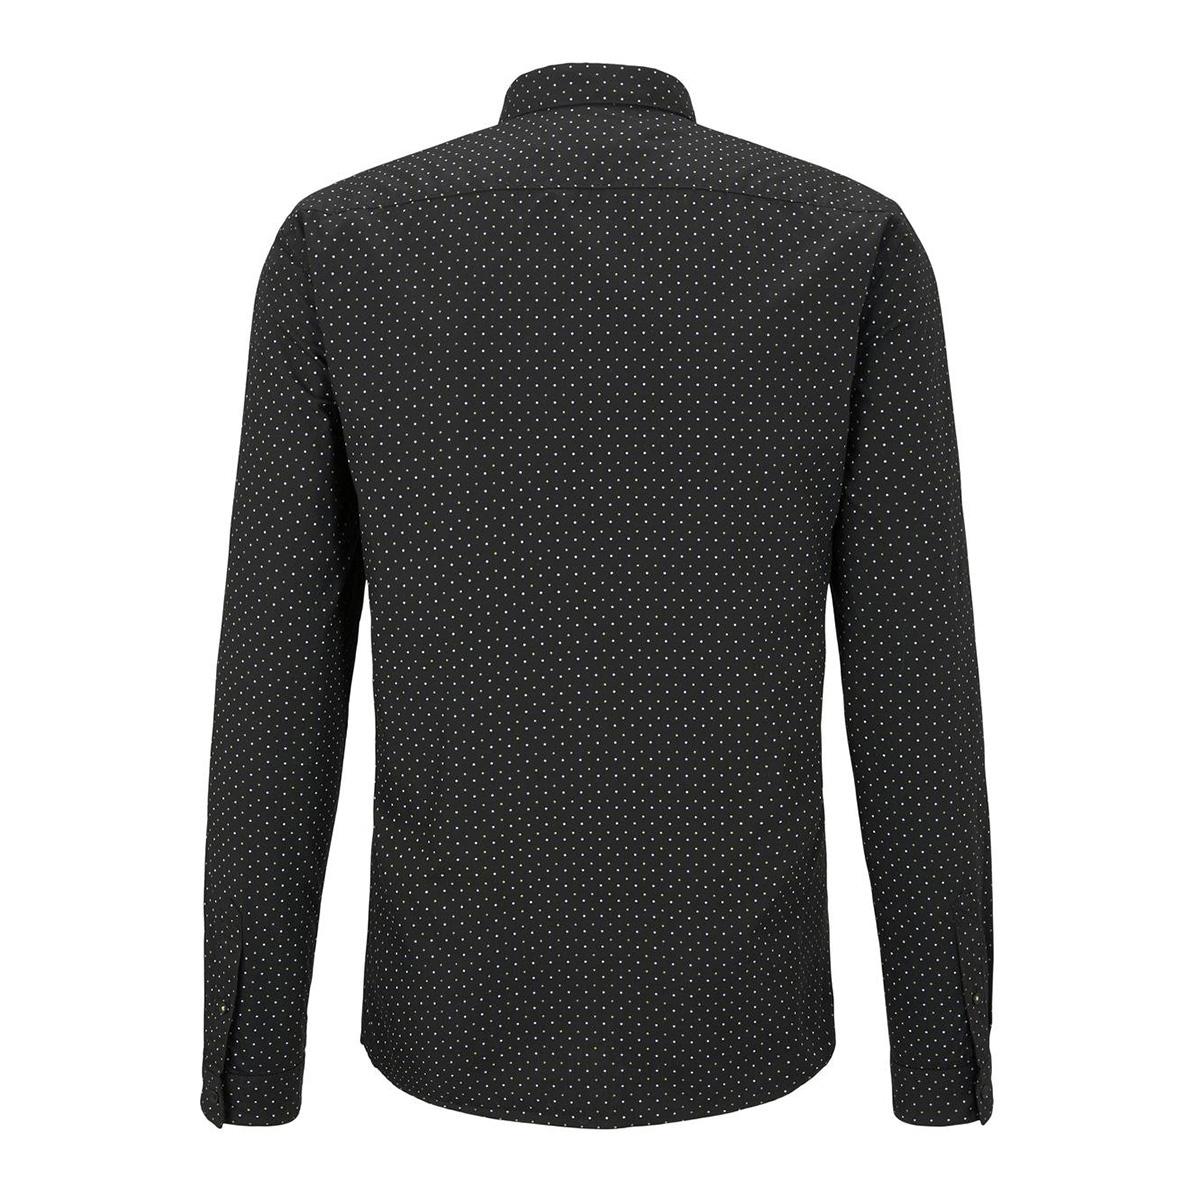 eenvoudig overhemd 1016083xx12 tom tailor overhemd 21214